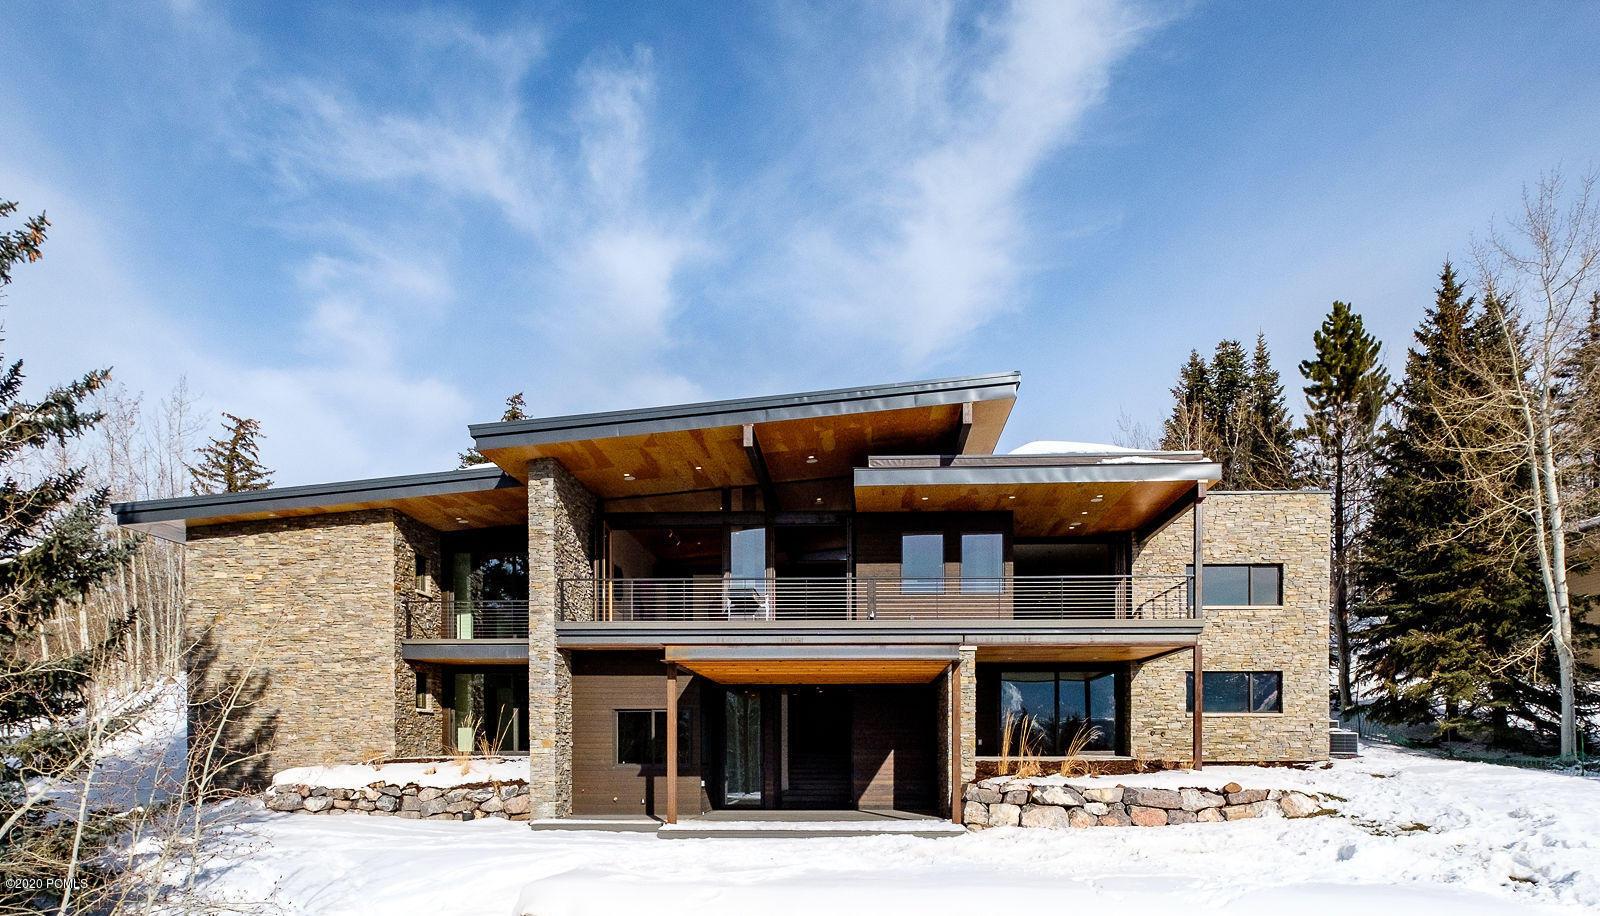 3349 American Saddler Drive, Park City, Utah 84060, 6 Bedrooms Bedrooms, ,8 BathroomsBathrooms,Single Family,For Sale,American Saddler,20190109112430415765000000